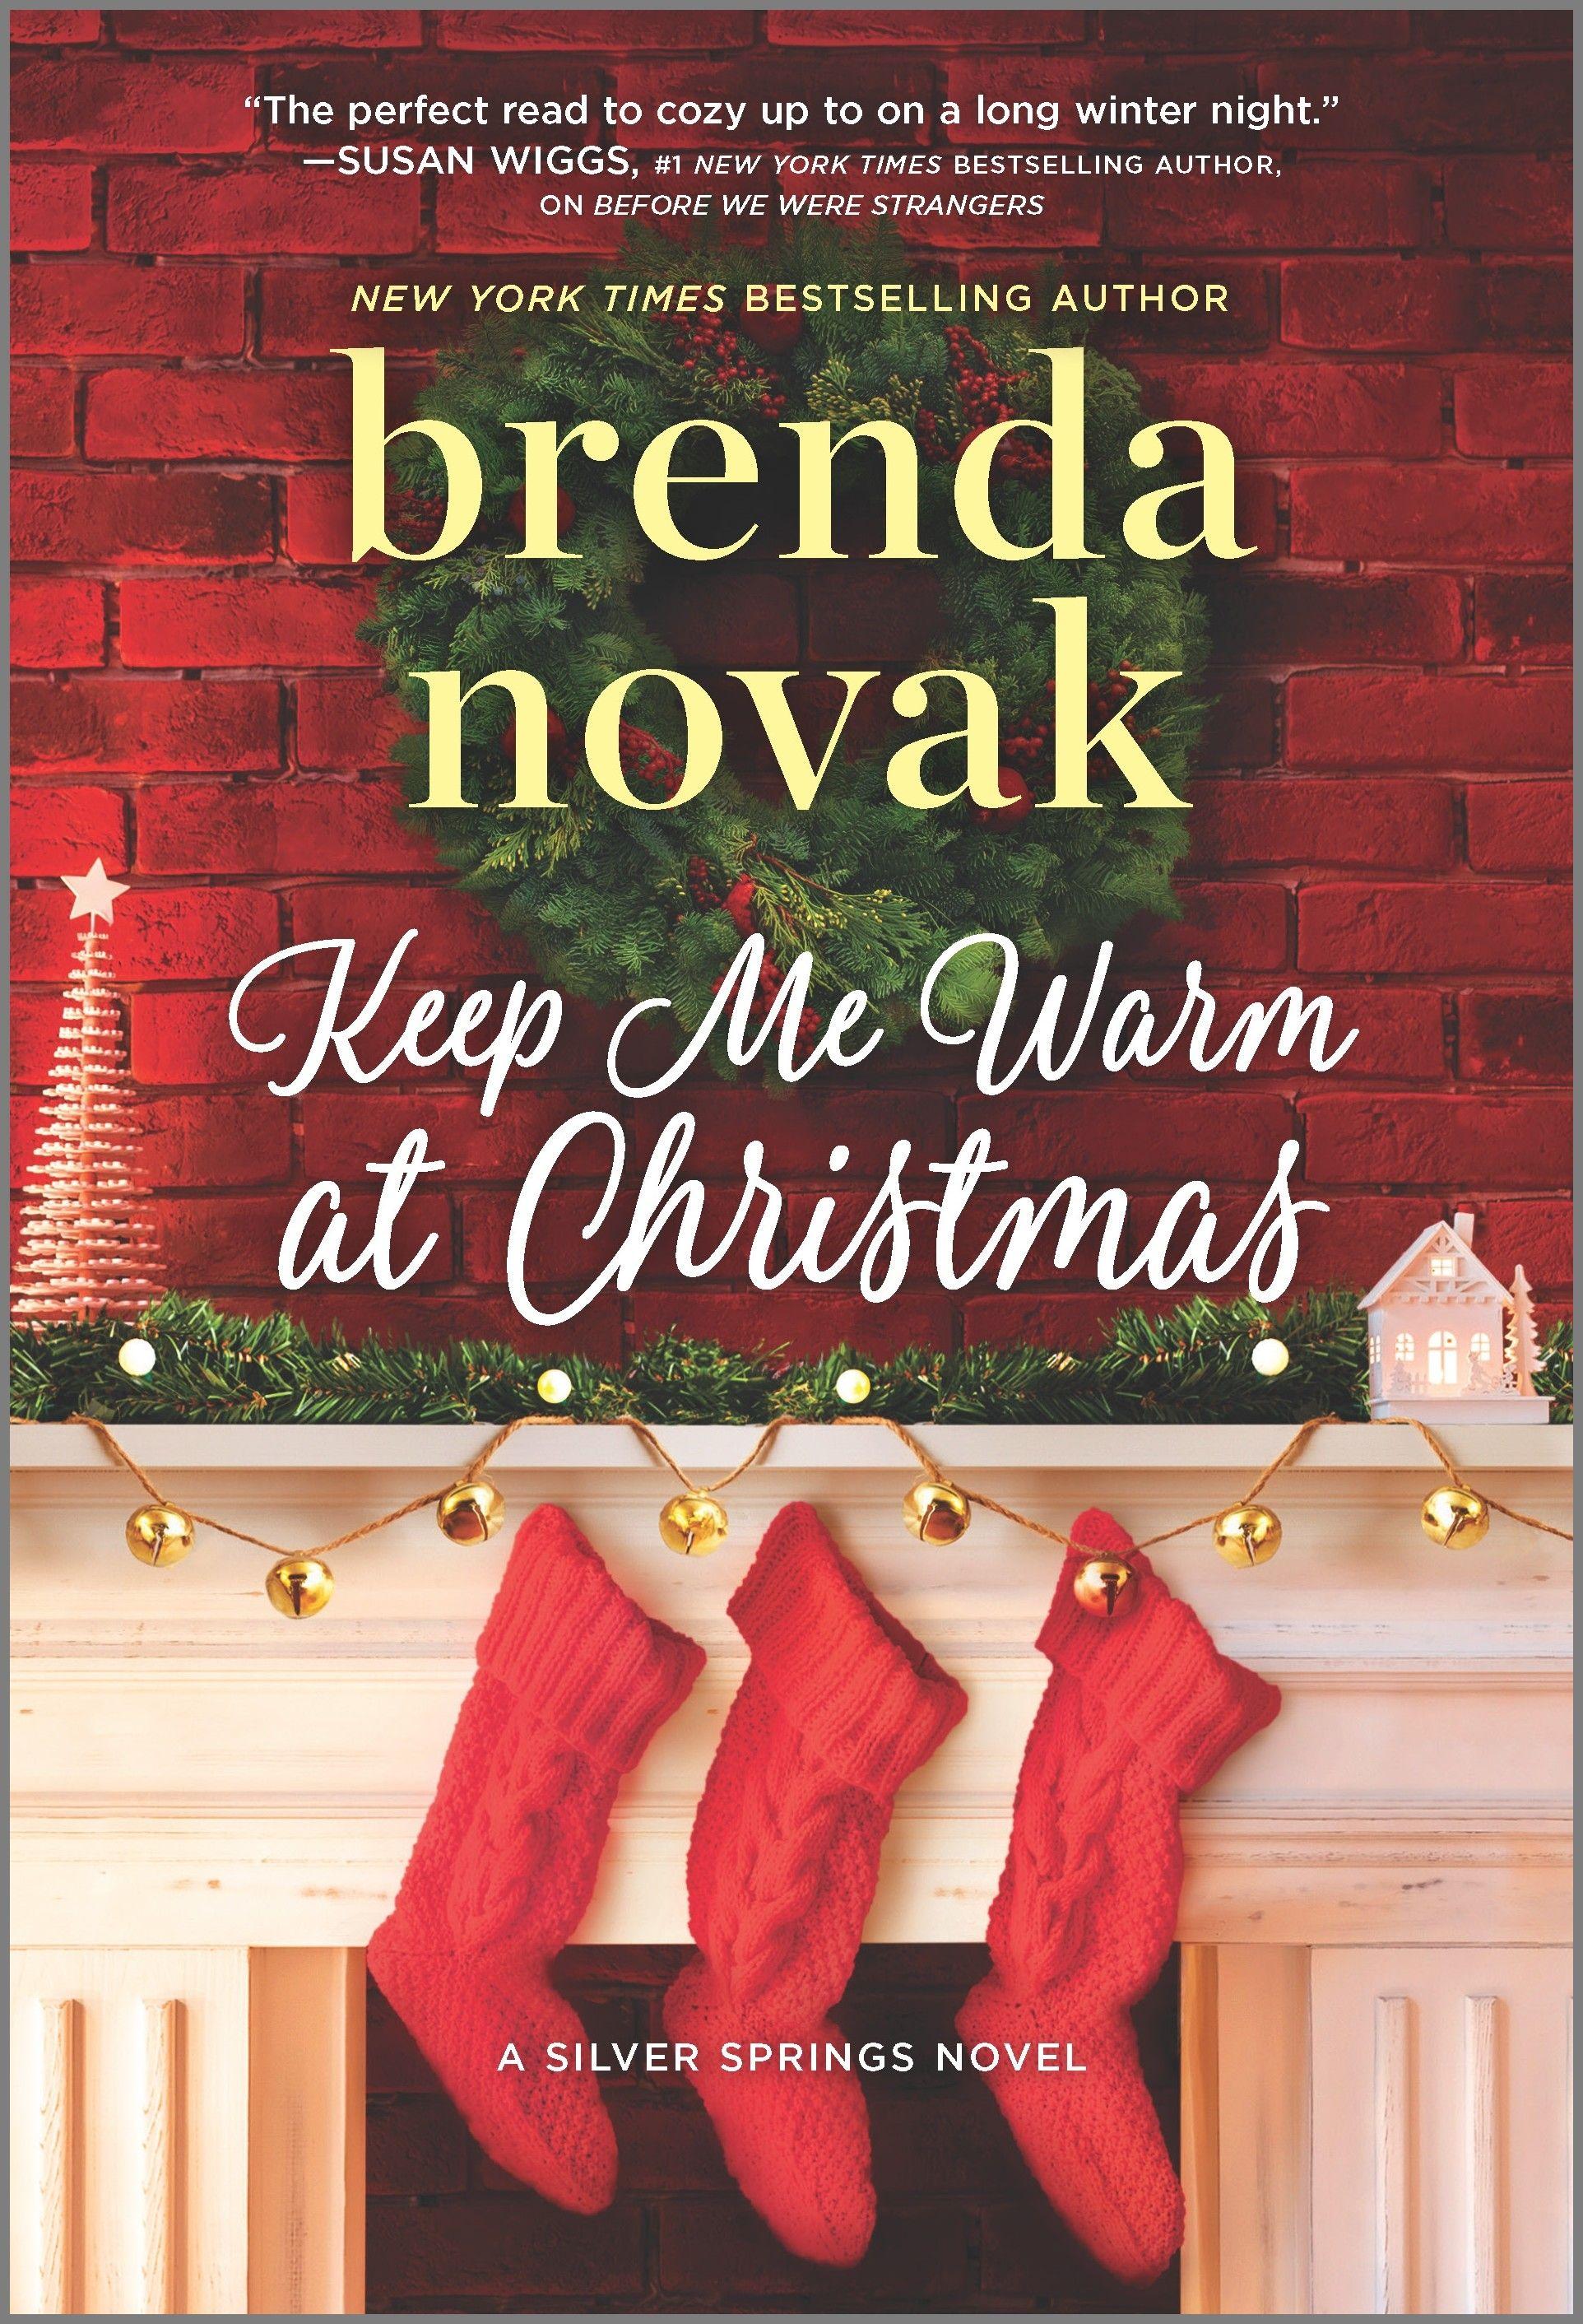 Keep Me Warm at Christmas by Brenda Novak